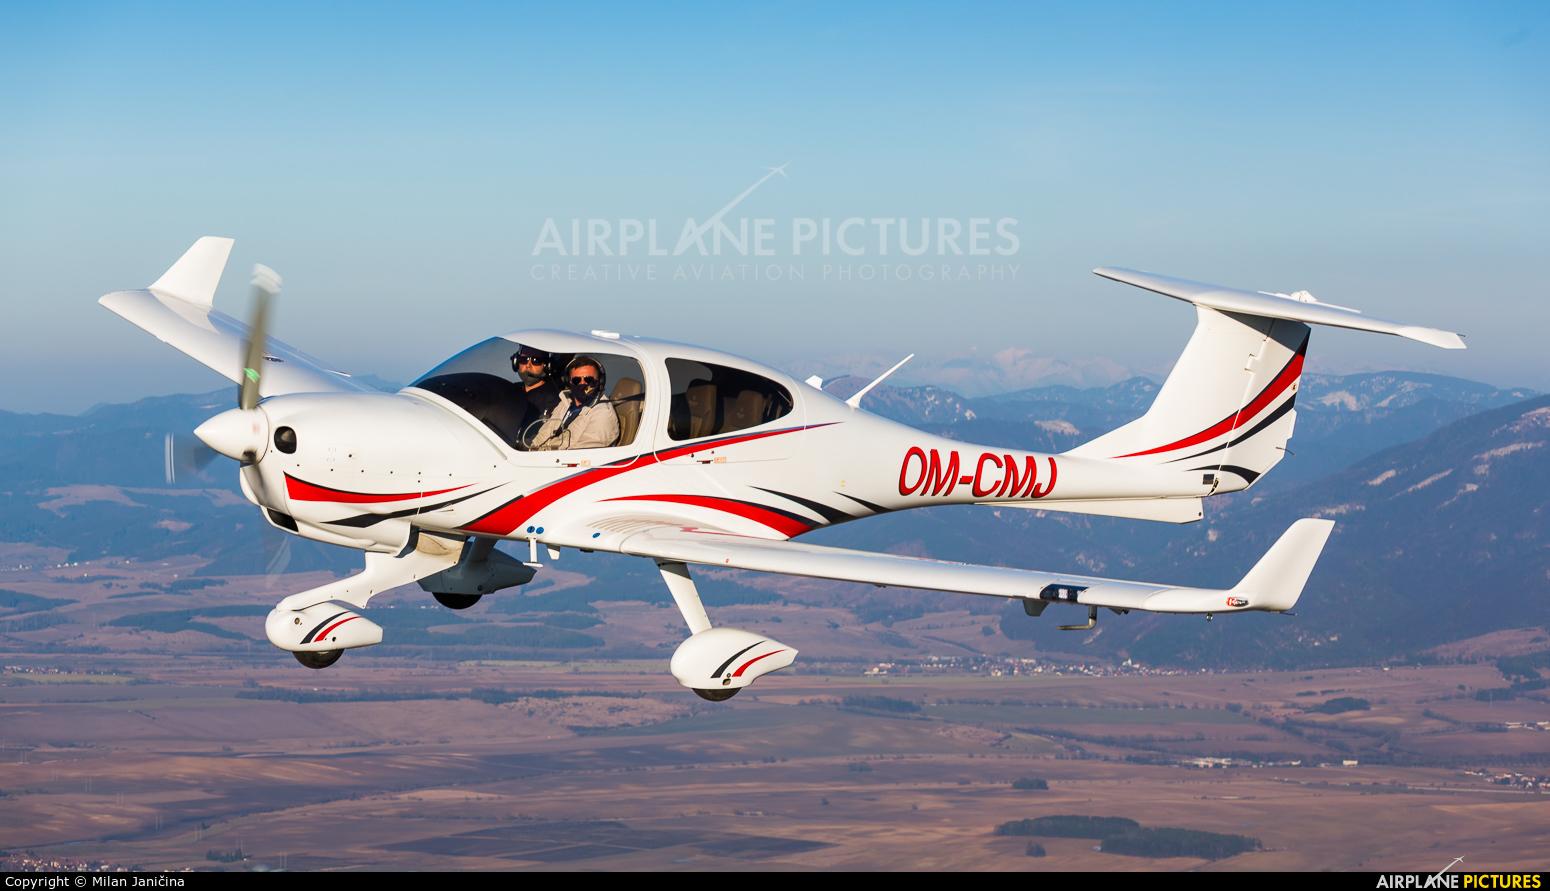 Seagle Air OM-CMJ aircraft at In Flight - Slovakia